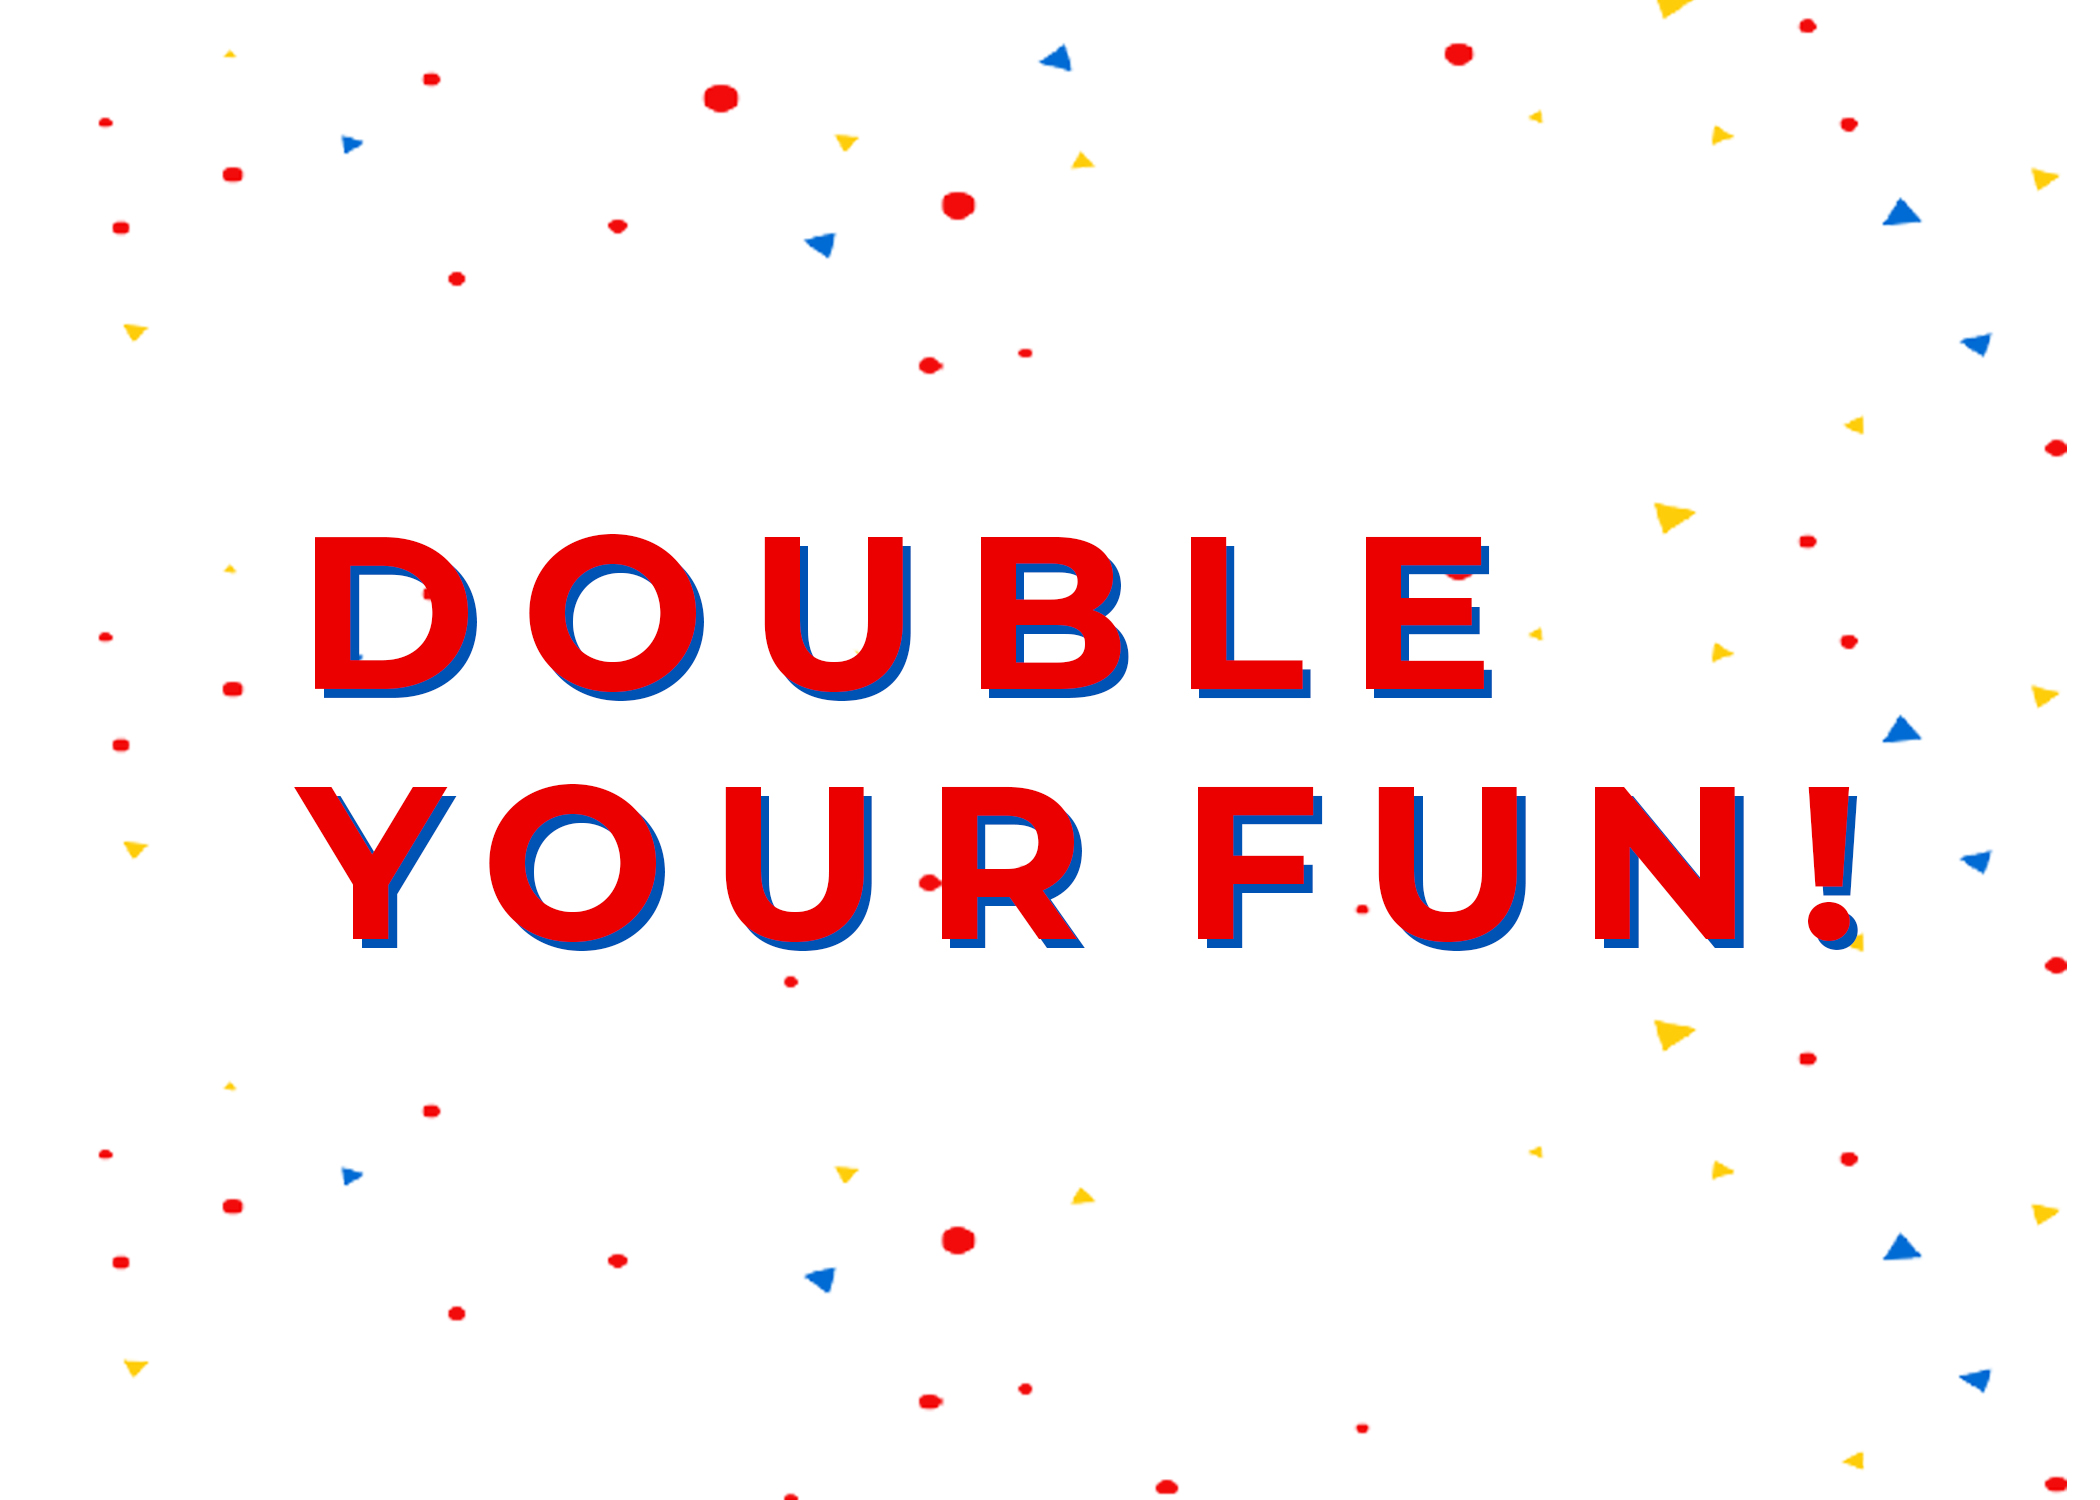 DoubleYourFun.jpg